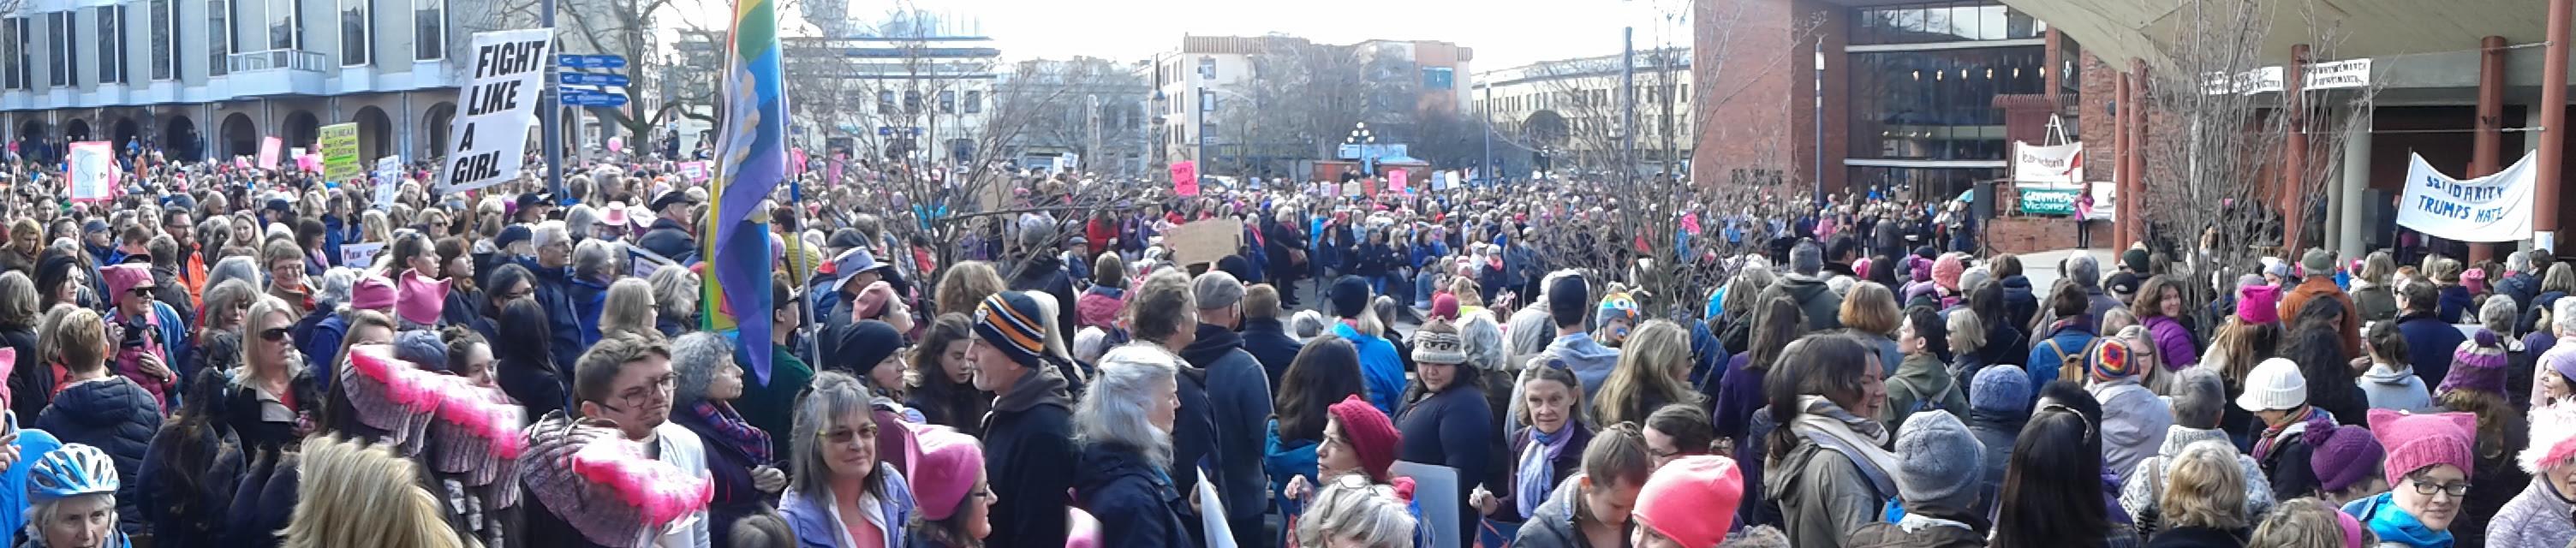 Trump_Rally.jpg